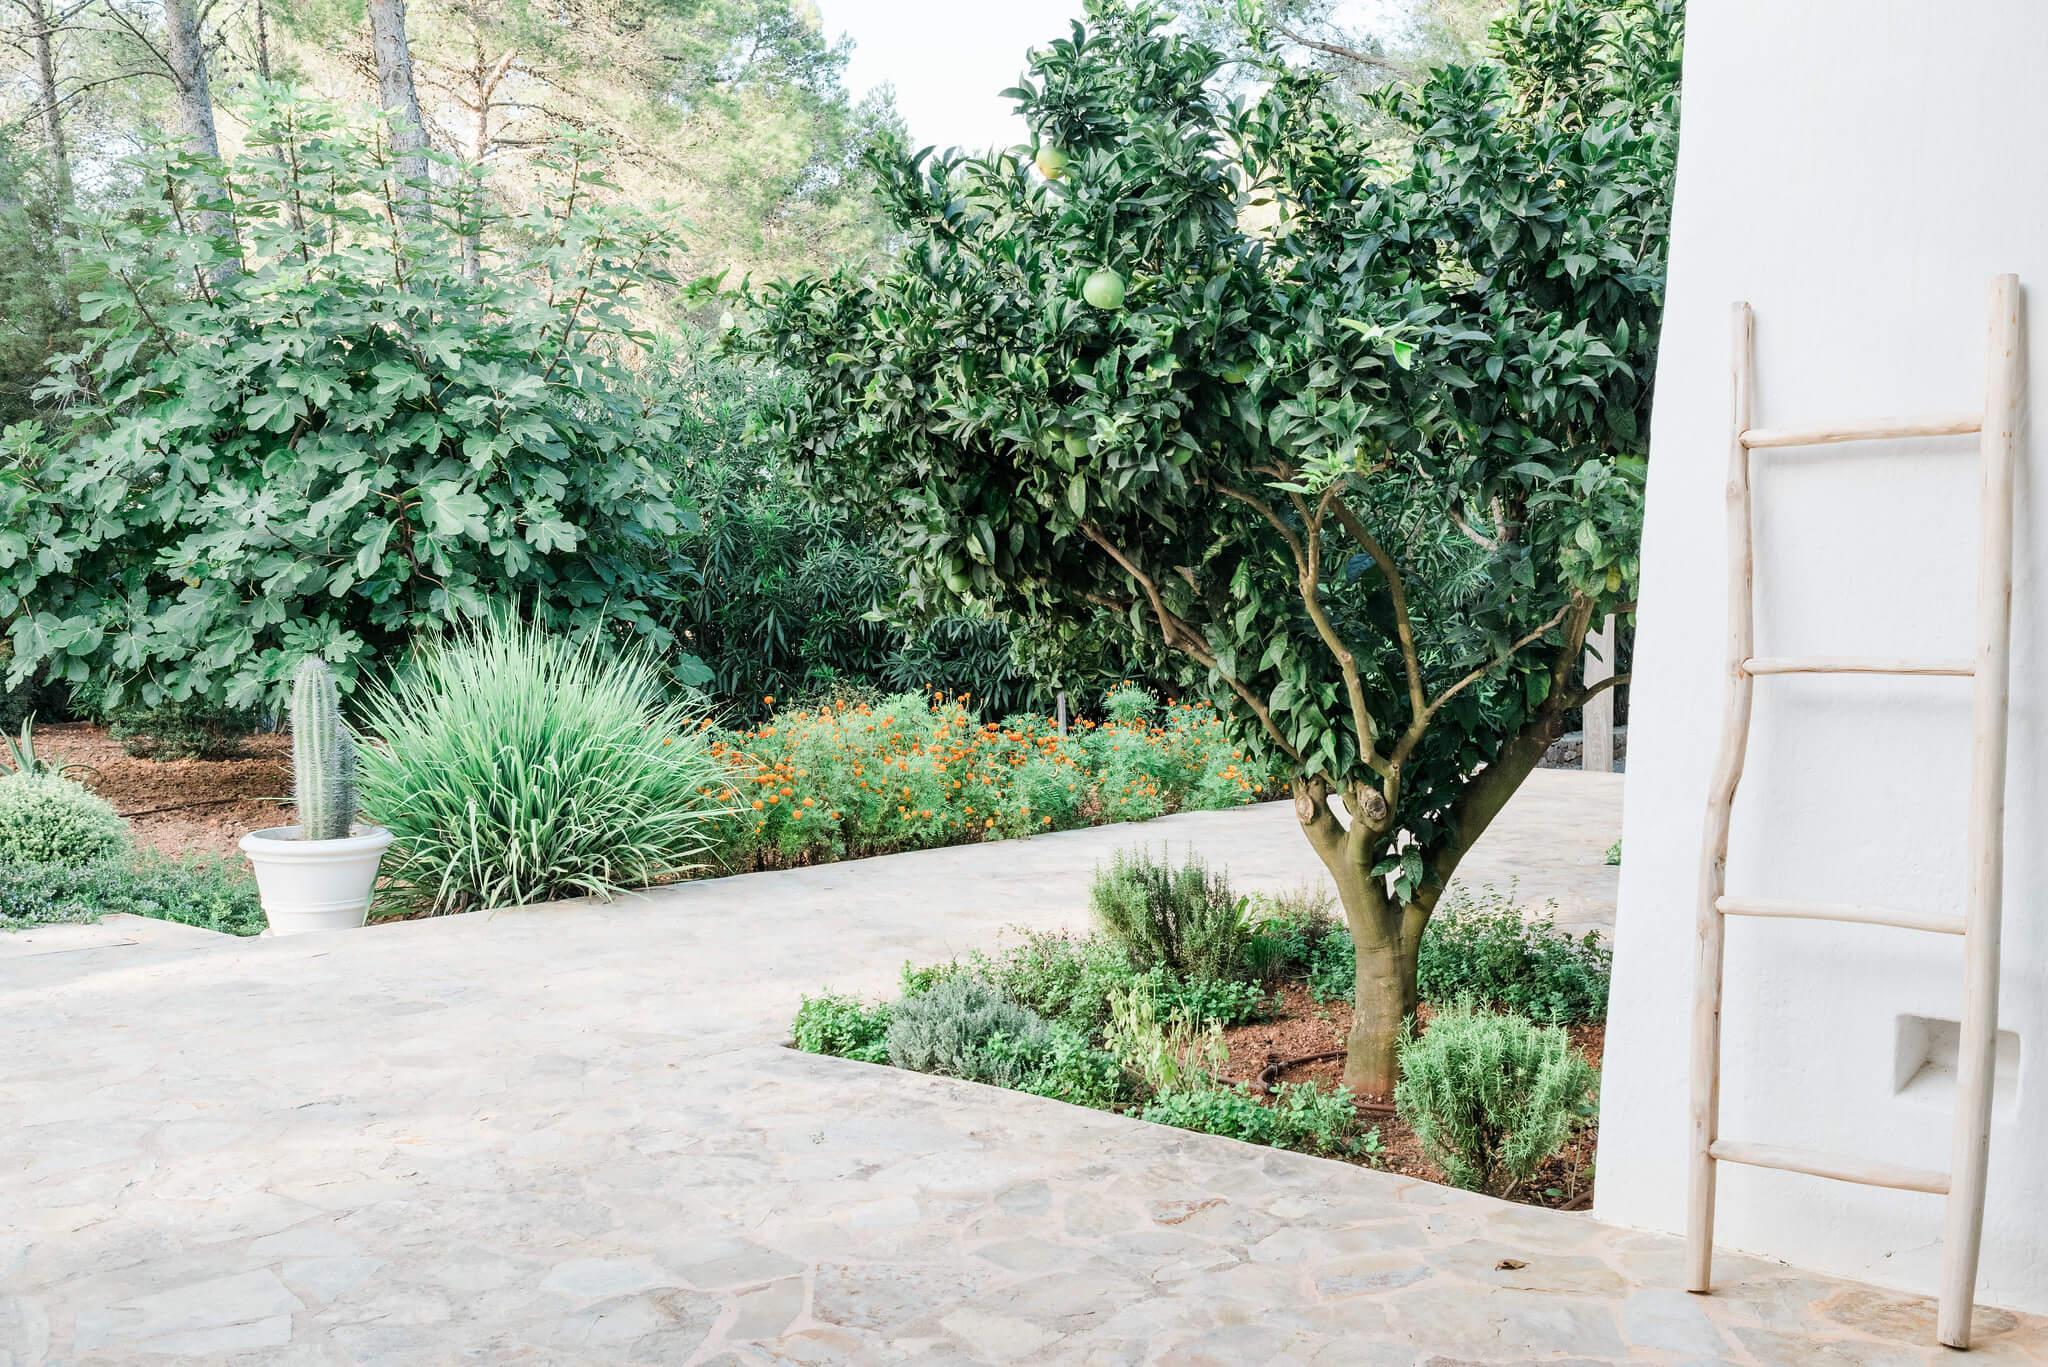 https://www.white-ibiza.com/wp-content/uploads/2020/05/white-ibiza-villas-can-terra-pathway.jpg